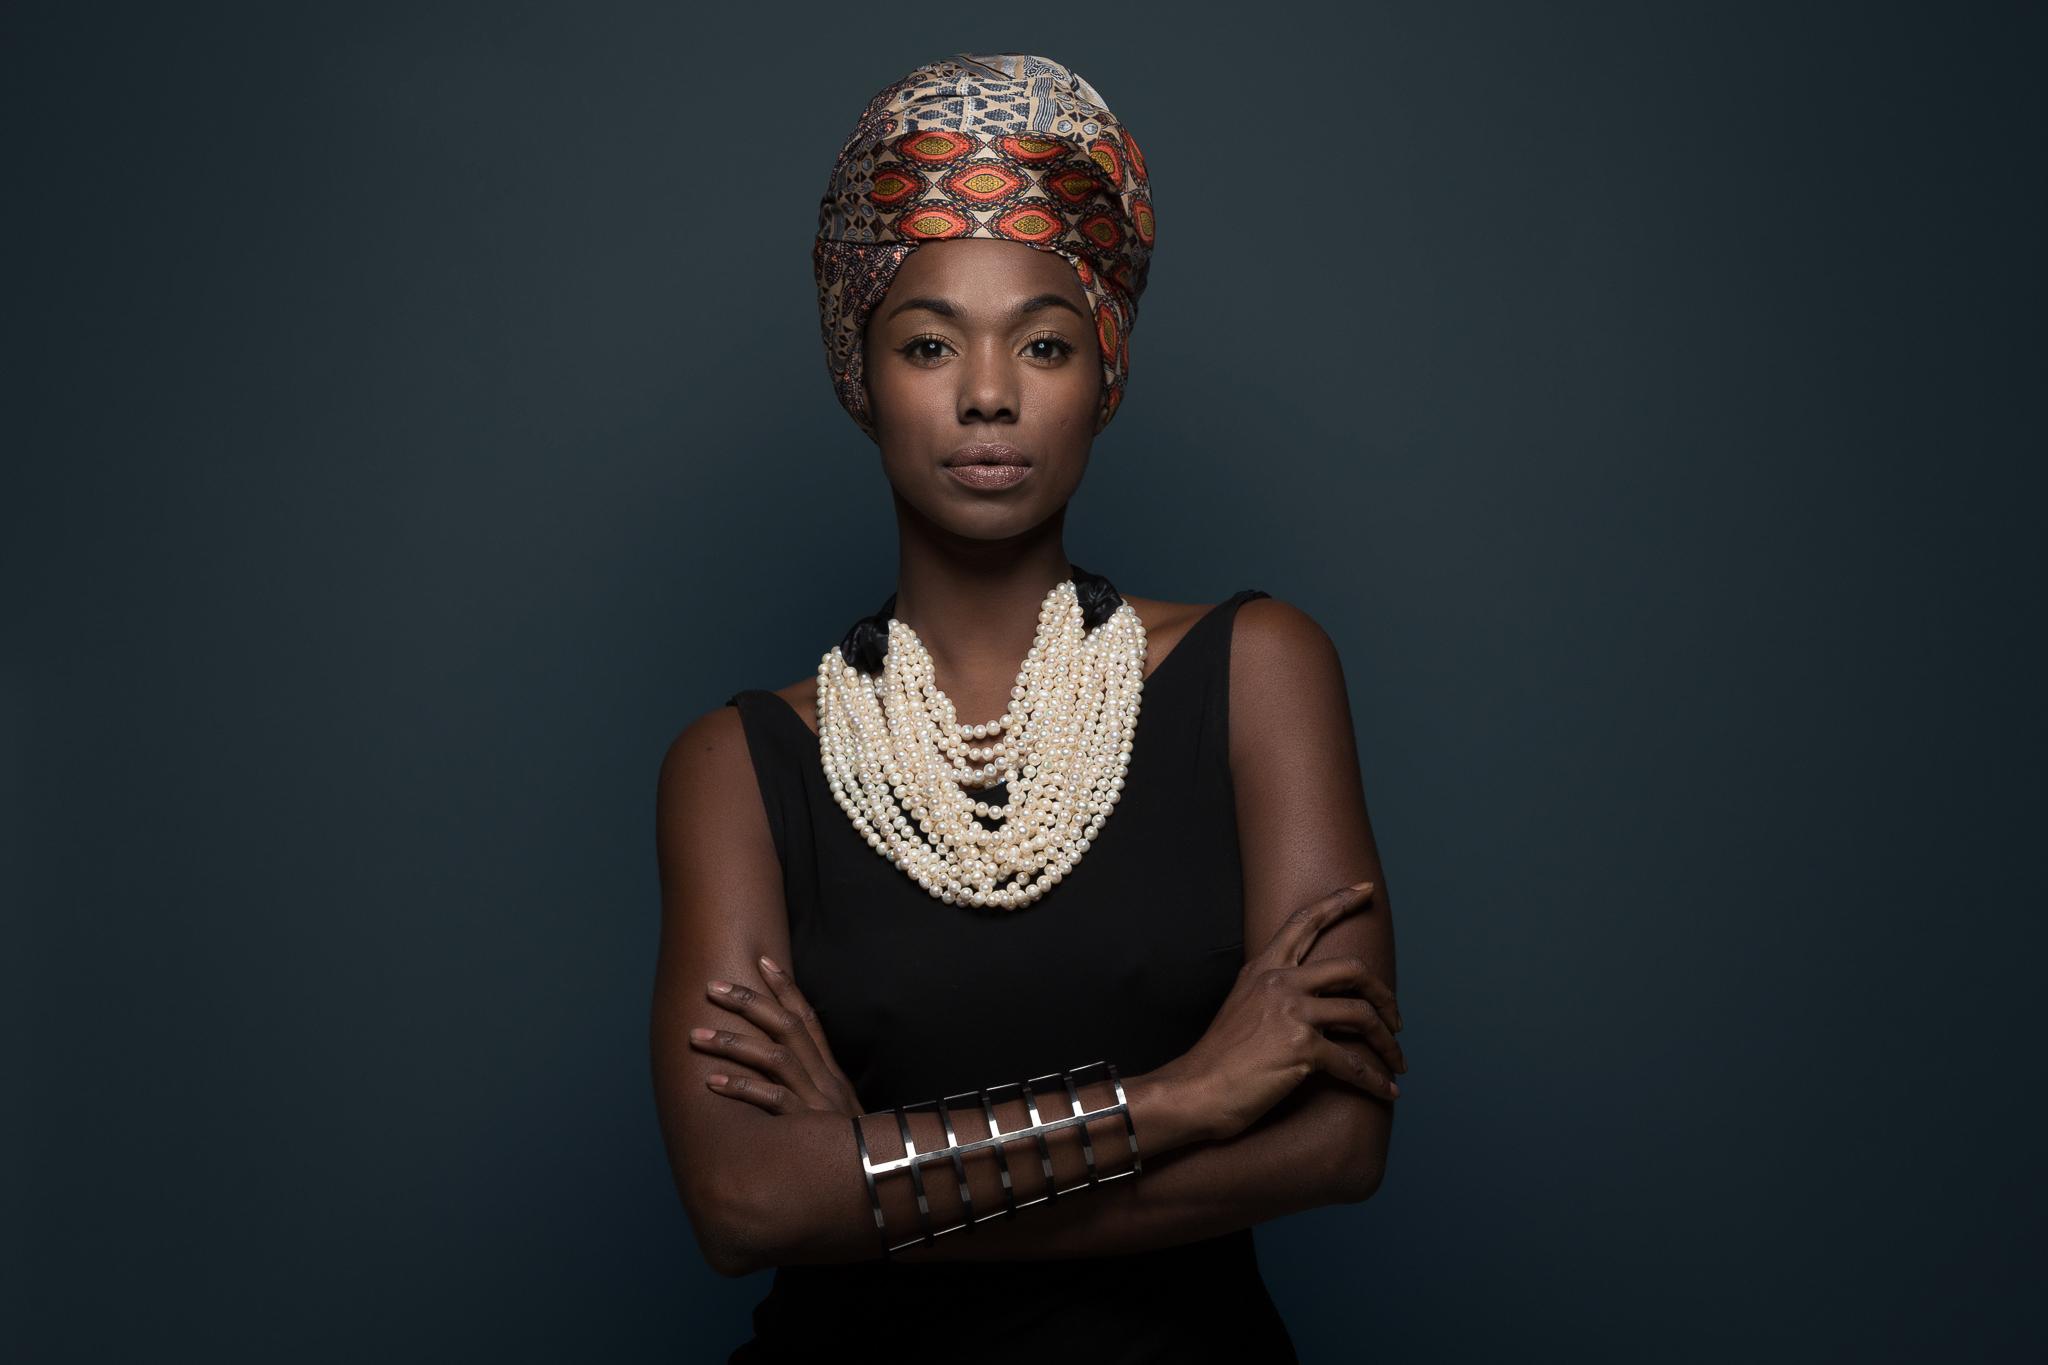 Ukka Lelle jewelry design